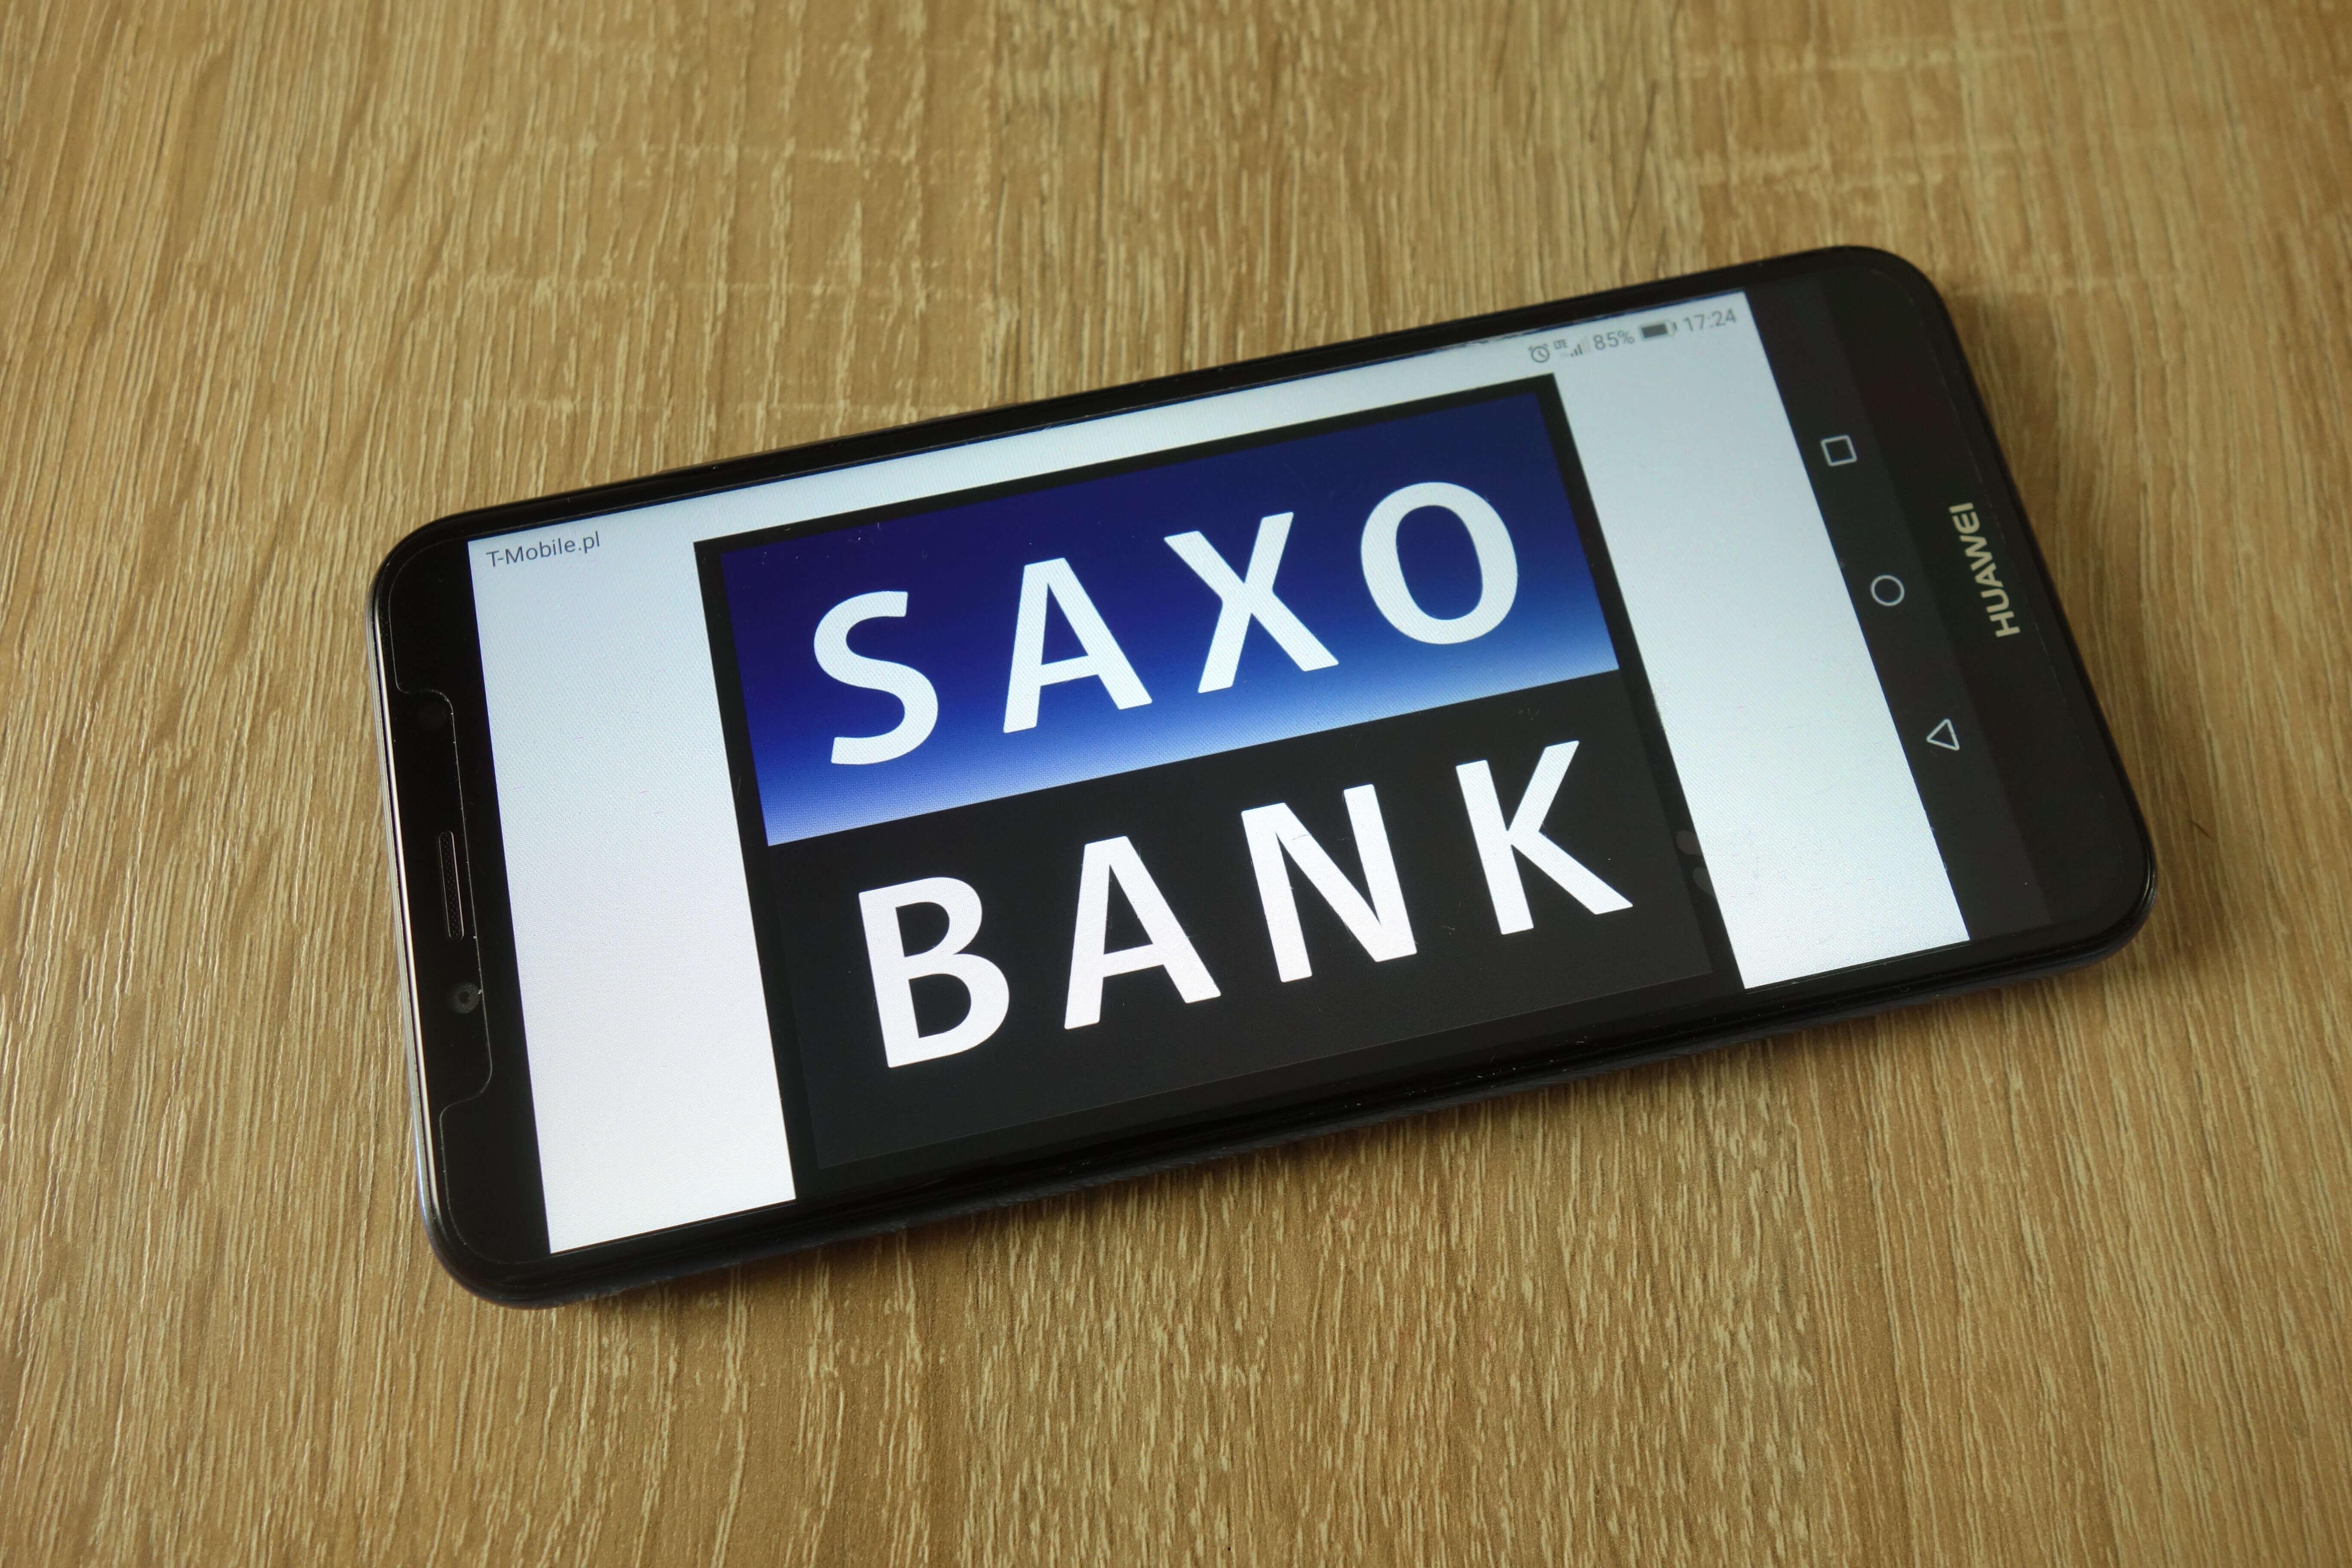 Saxo Bank and its financial results